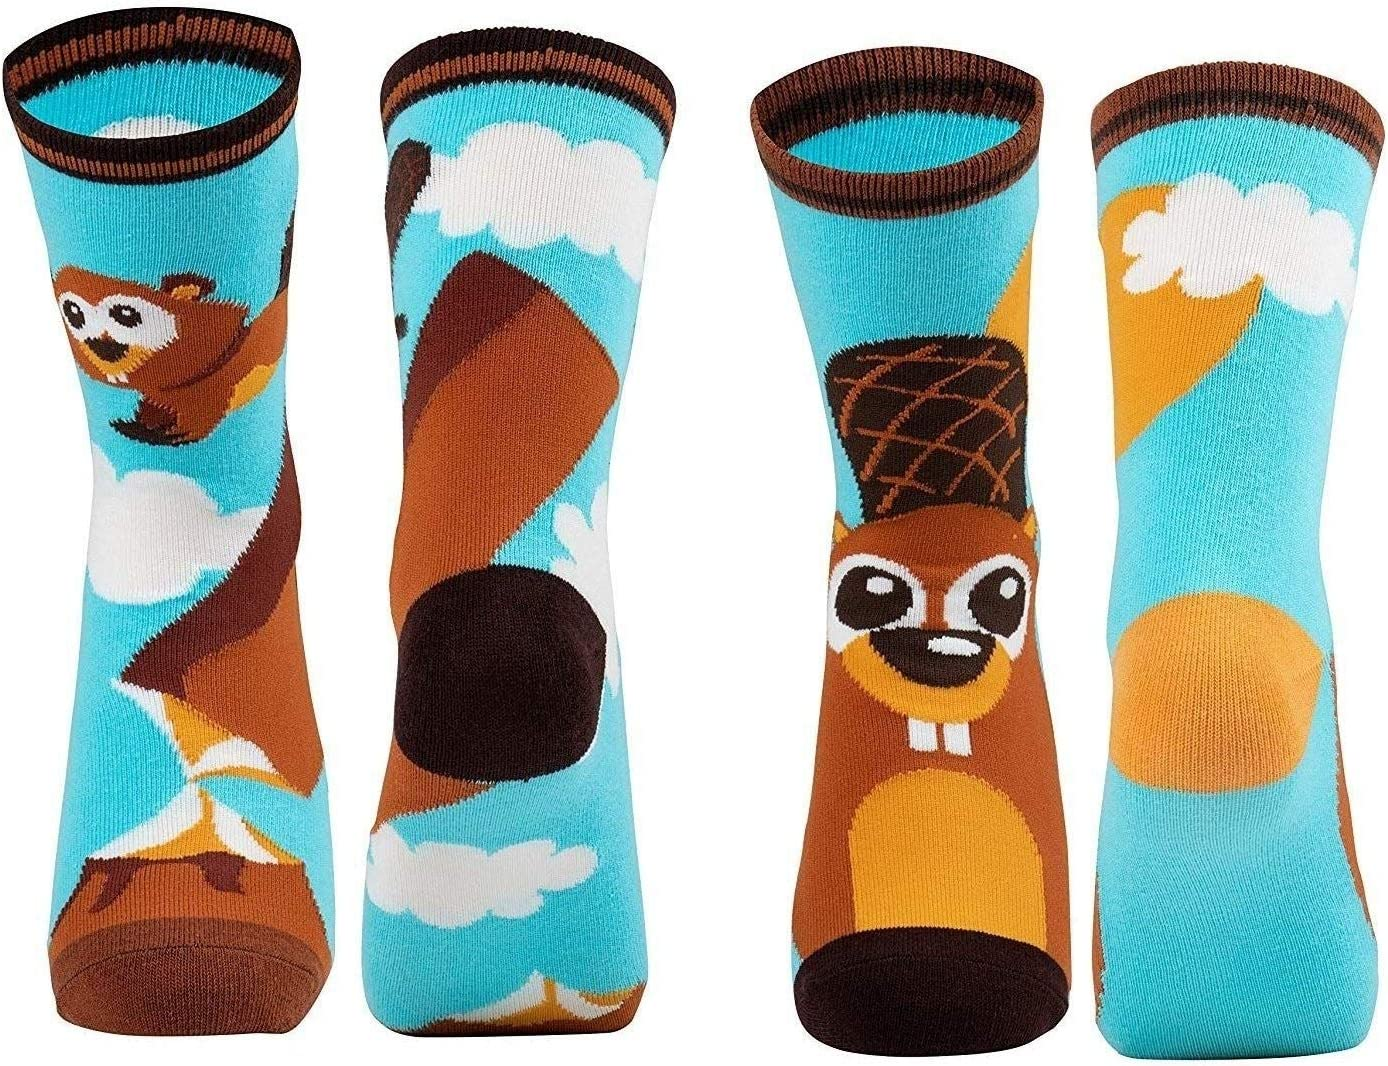 2-Pair Girls Crew Socks Cute Cartoon Beaver Animal Pet Print for Kids US 4-8 Multi Color Cotton